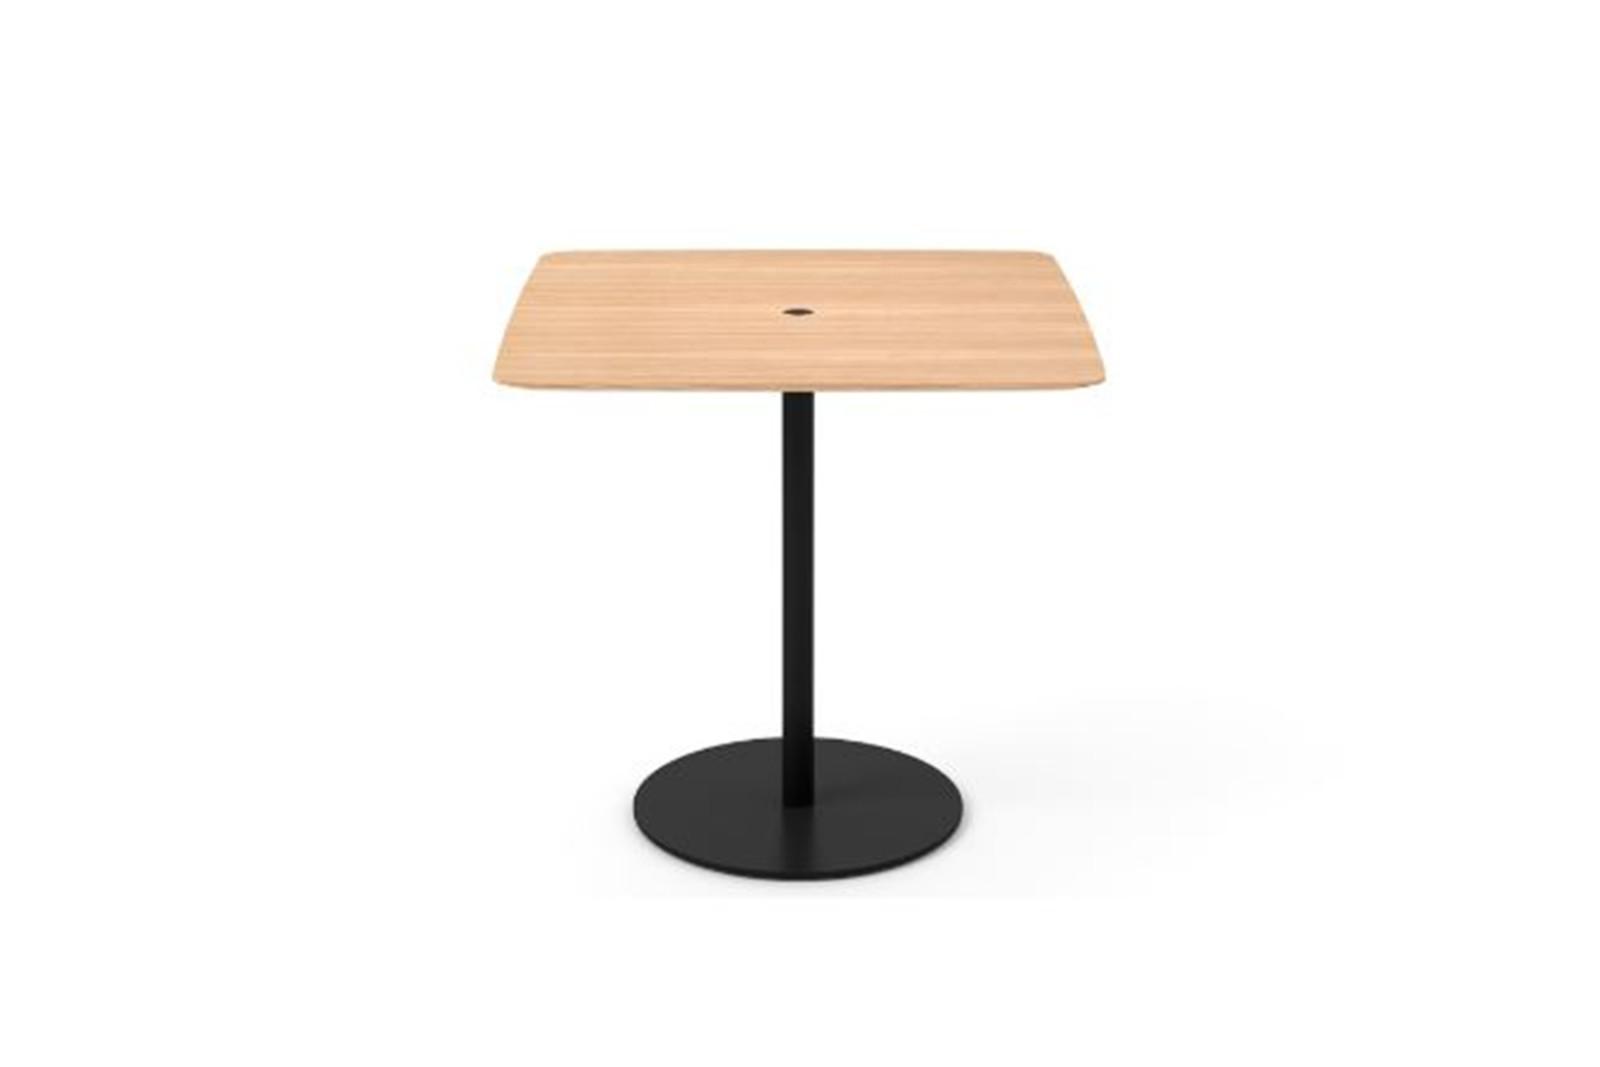 Núcleo Dining Table, Square Black Textured Metal, Whitened Oak, 80